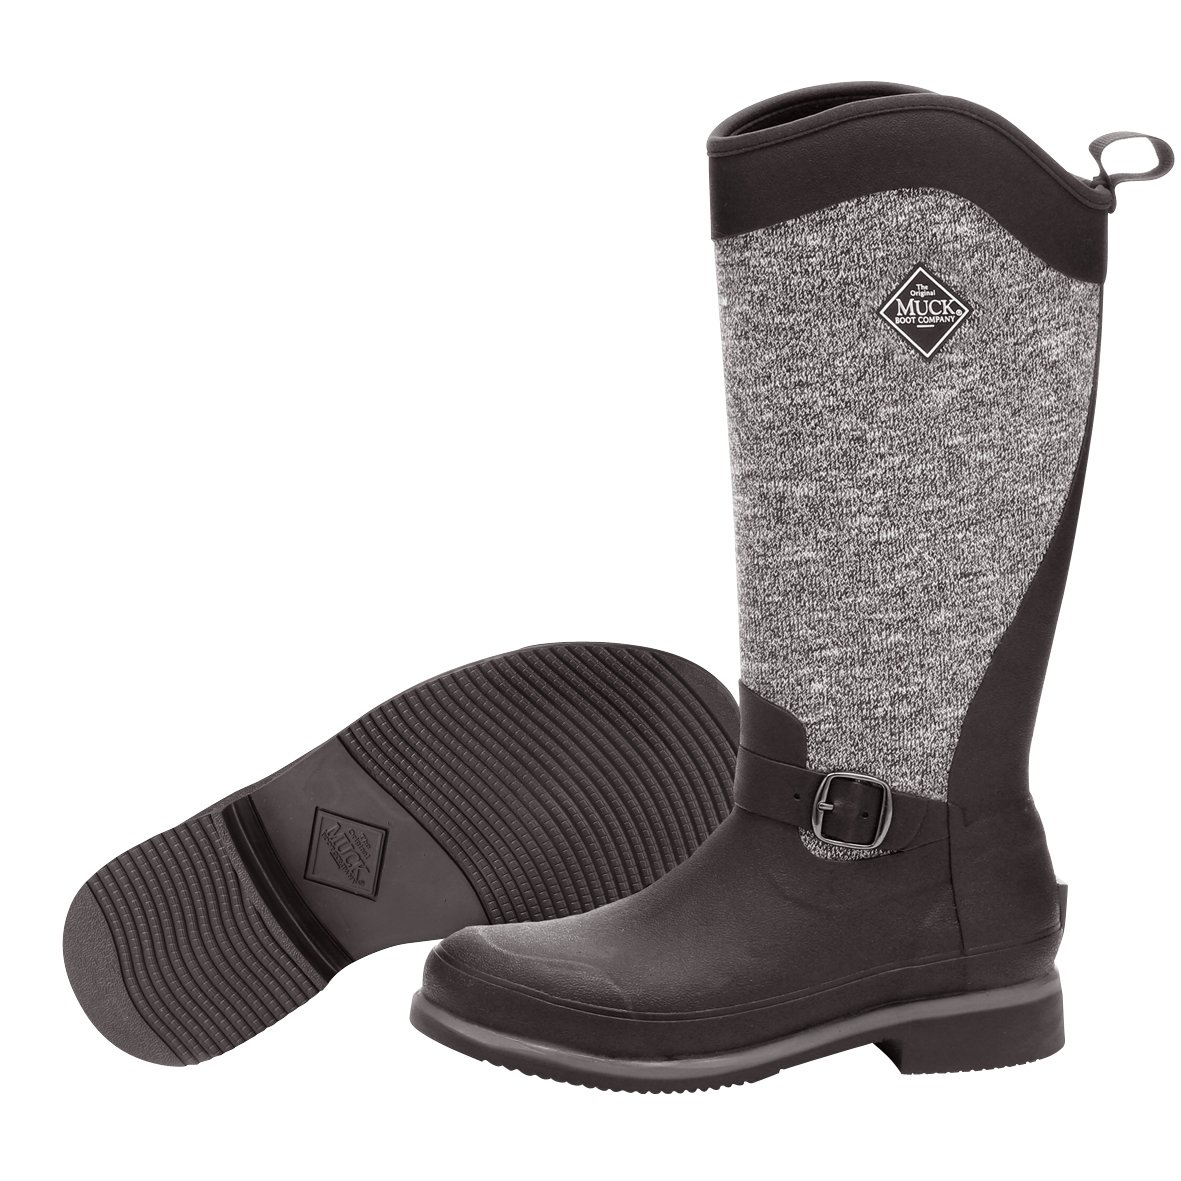 Reign Boots FemmeNoirblack Bottines SupremeBottesamp; De Pluie grey36 Eu Muck v8n0mwON